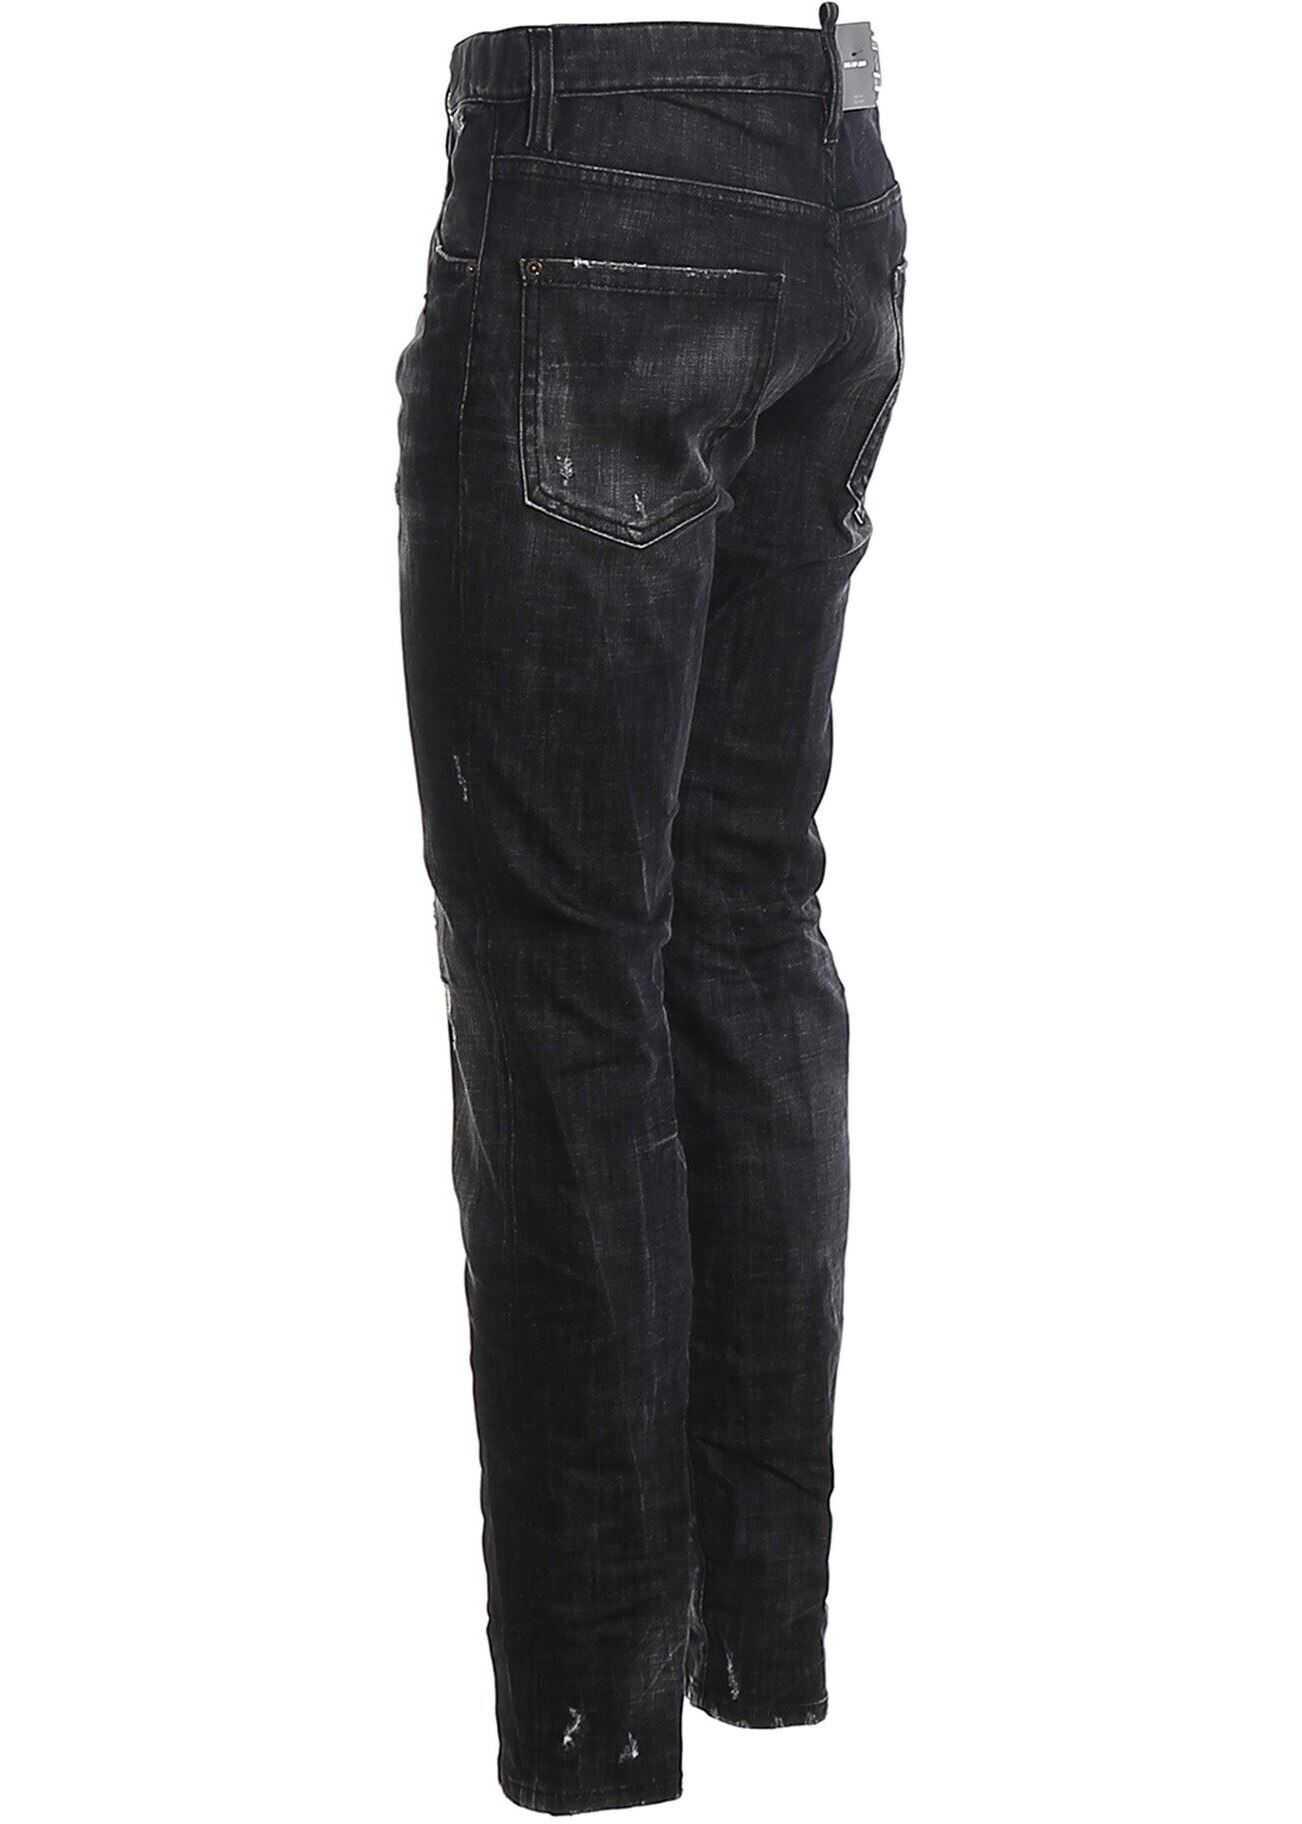 DSQUARED2 Cool Guy Denim Jeans Black